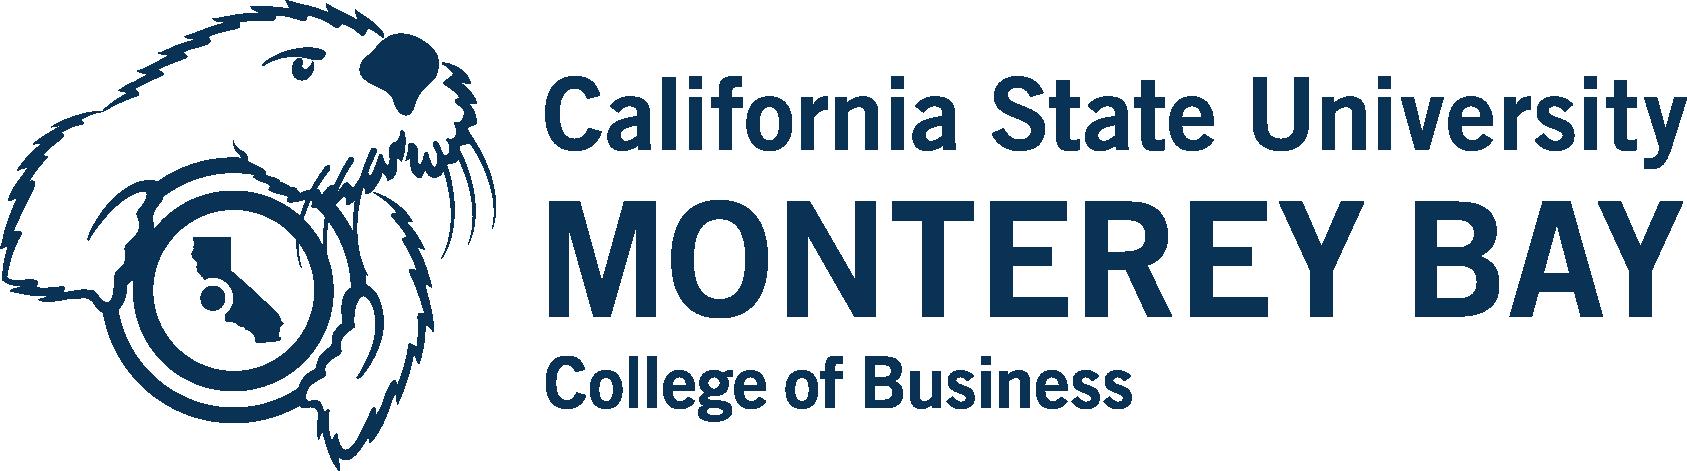 CSUMB College of Business logo